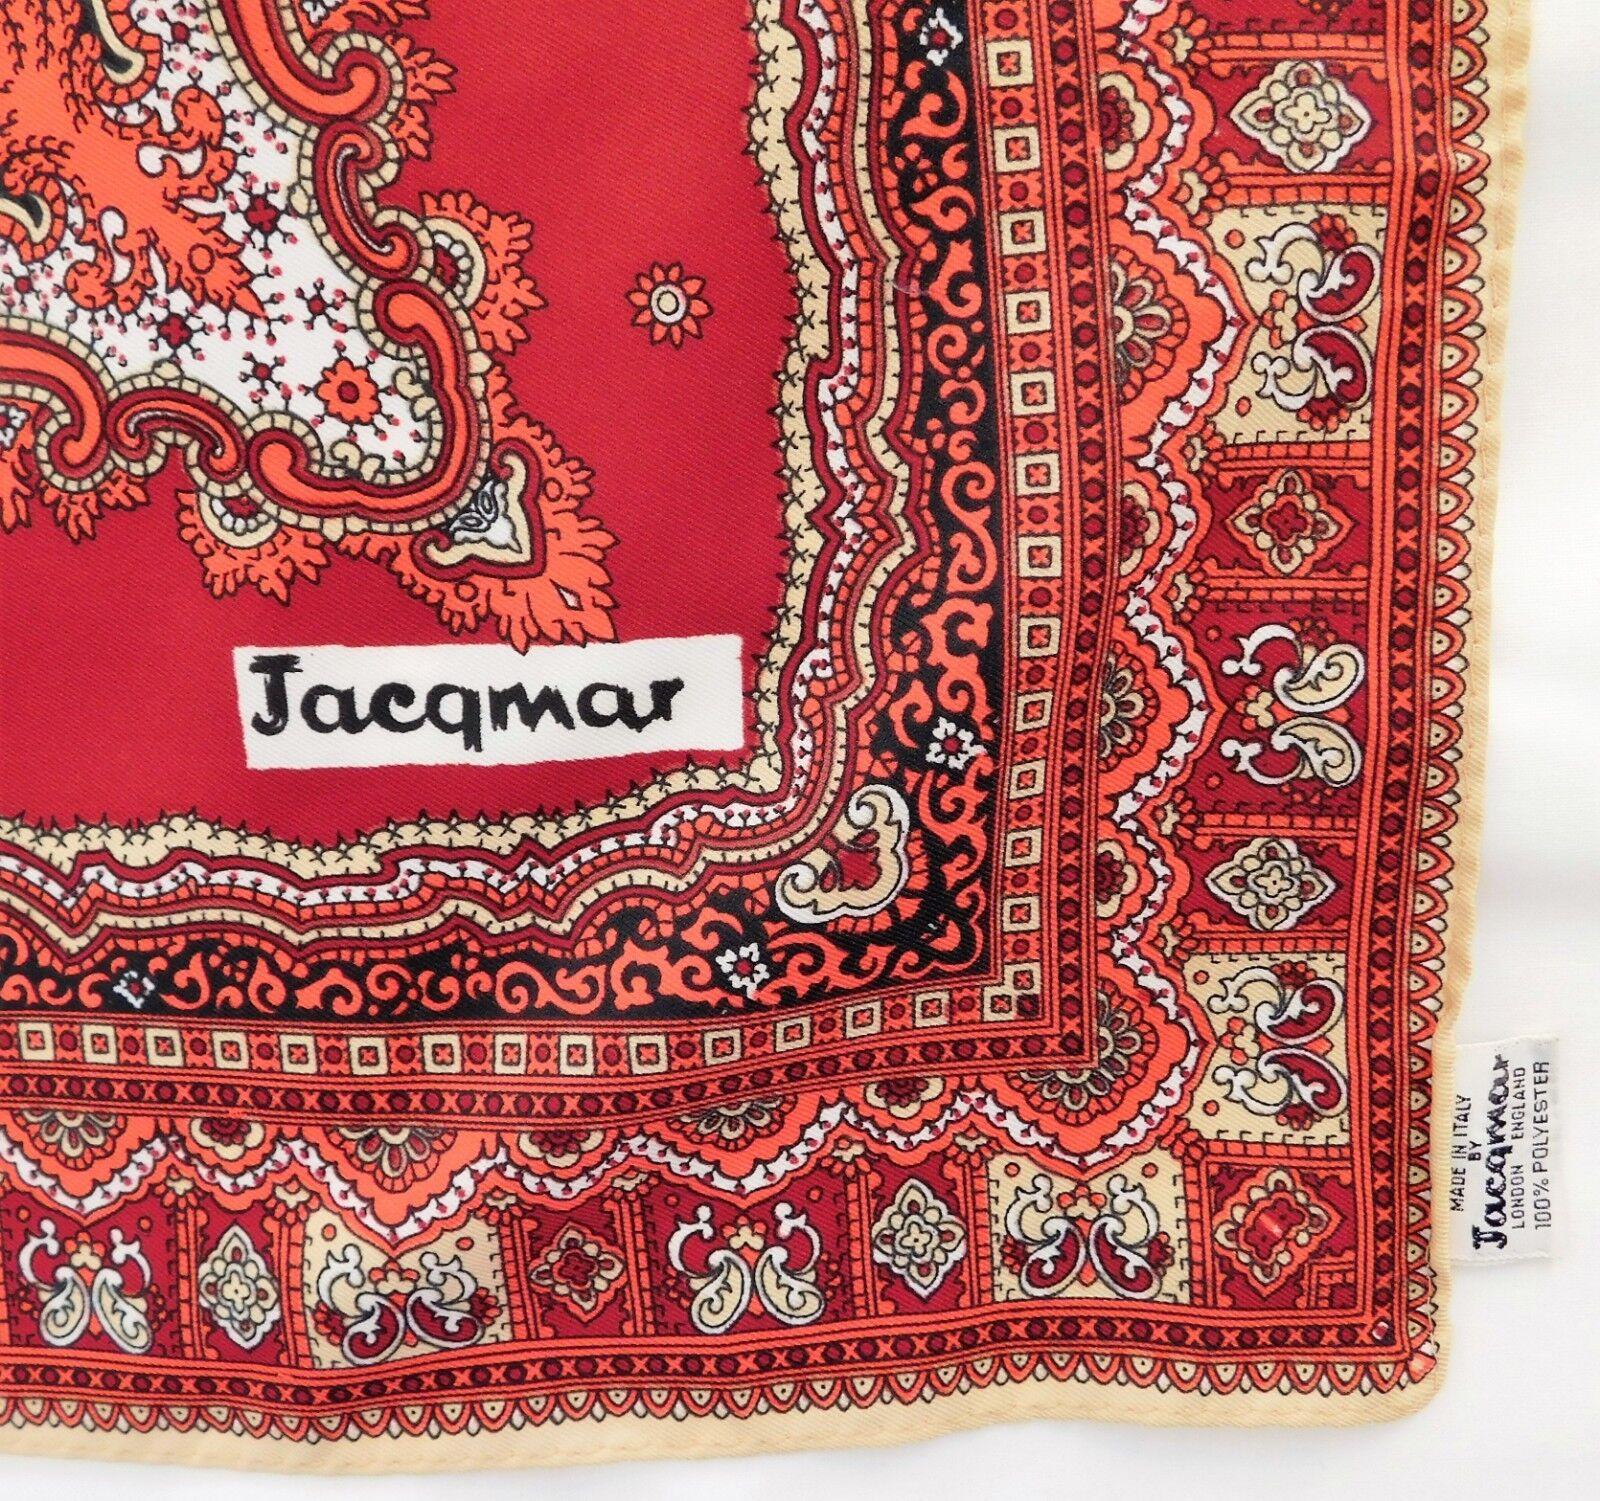 "Vintage Jacqmar Italian scarf 30"" square Paisley pattern machine washable gq"